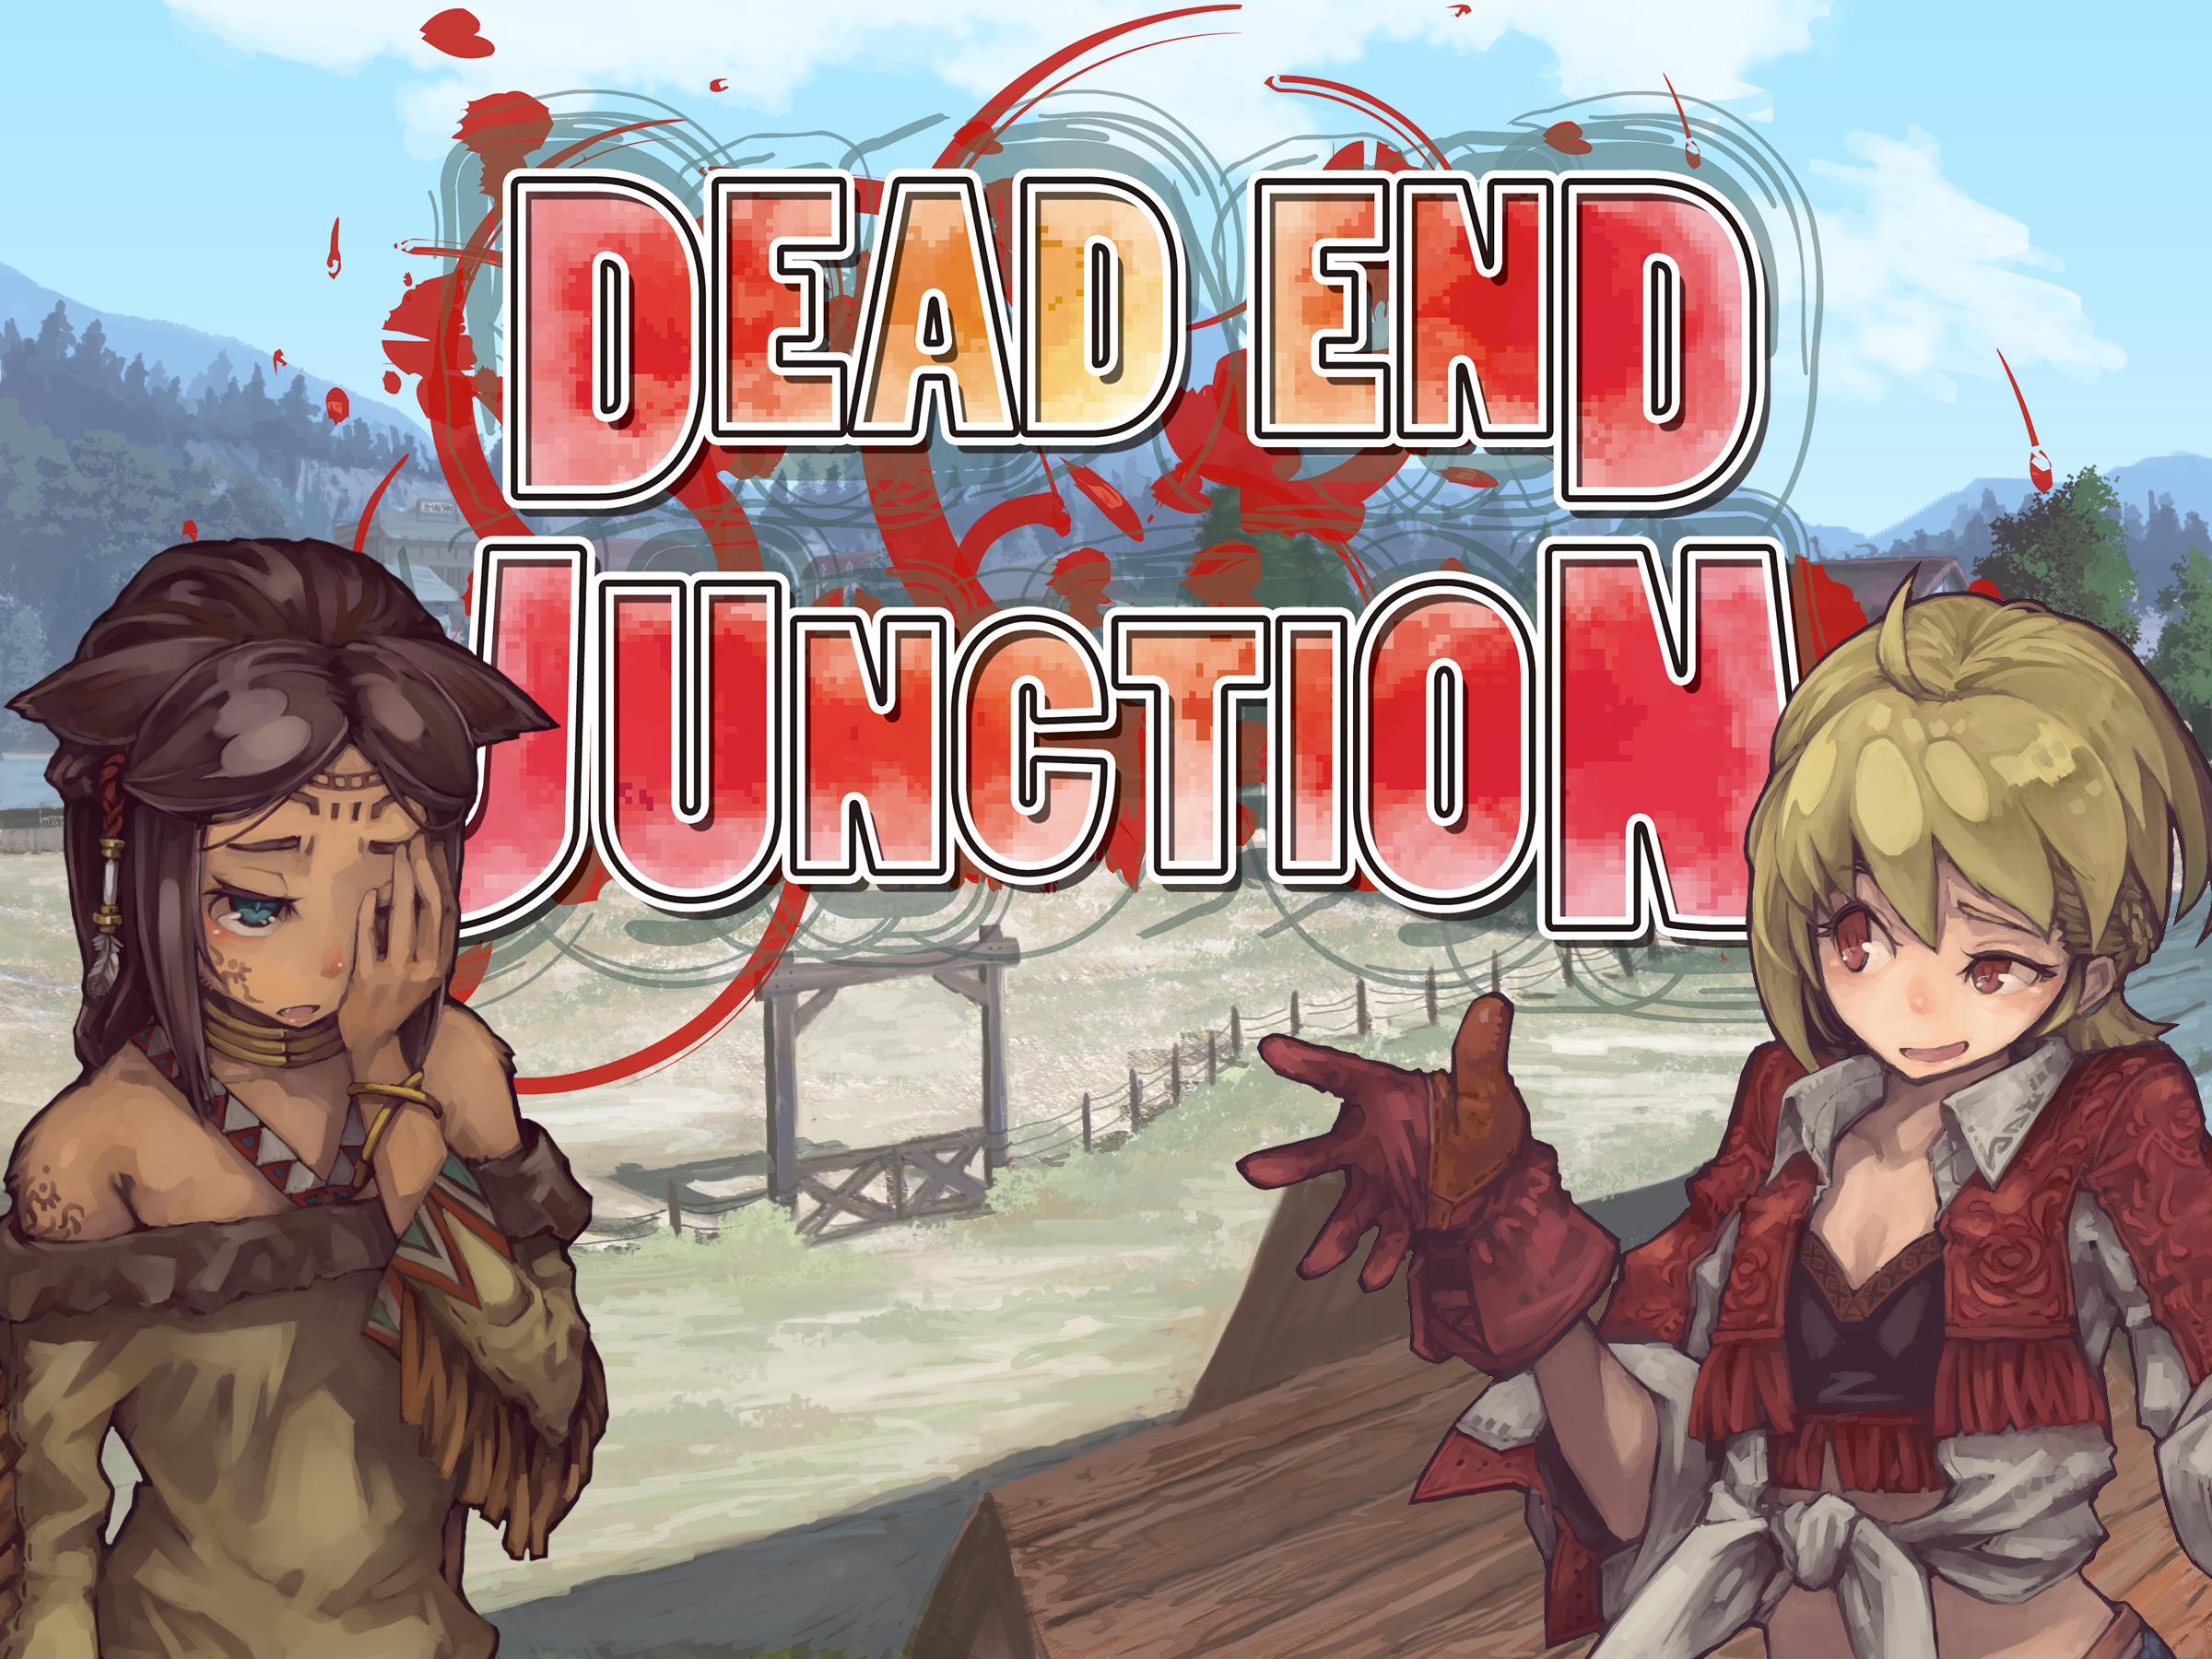 dead-end-junction-mangagamer-above-the-cut-image_01